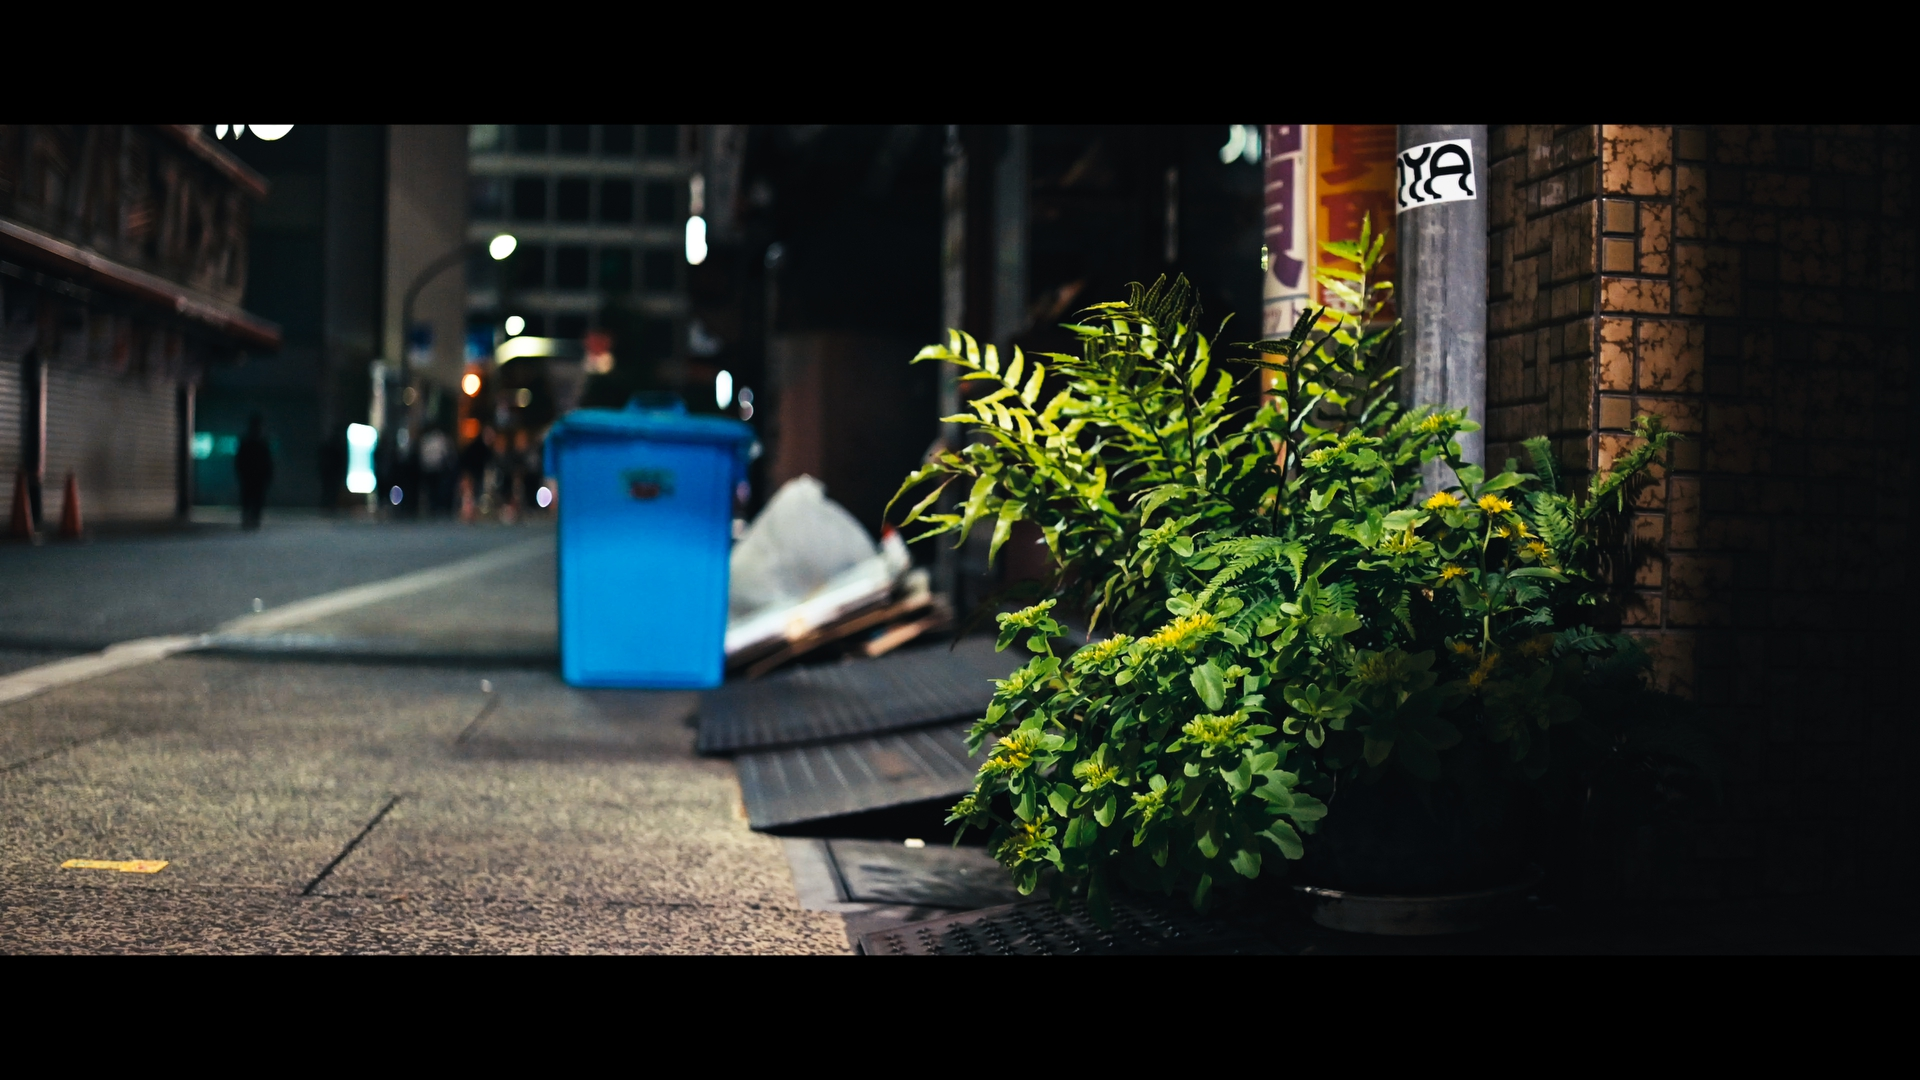 【SIRUI】アナモルフィックレンズで気分は映画監督